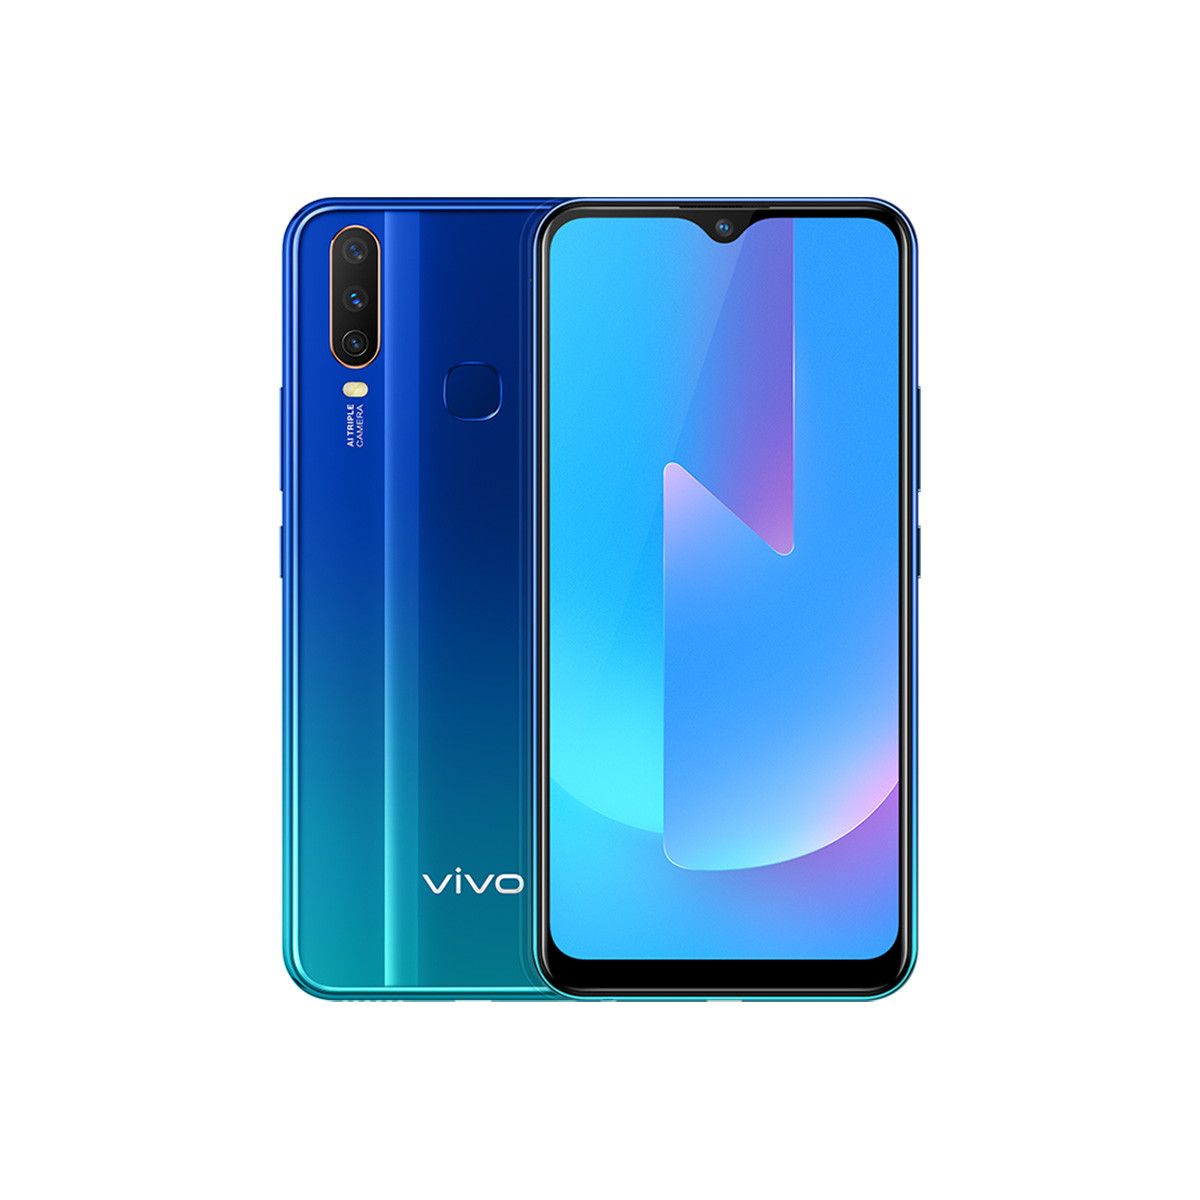 vivovivo U3x 5000mAh大电池千元拍照智能手机U3x 深湖蓝  (6+64G)  多套餐J